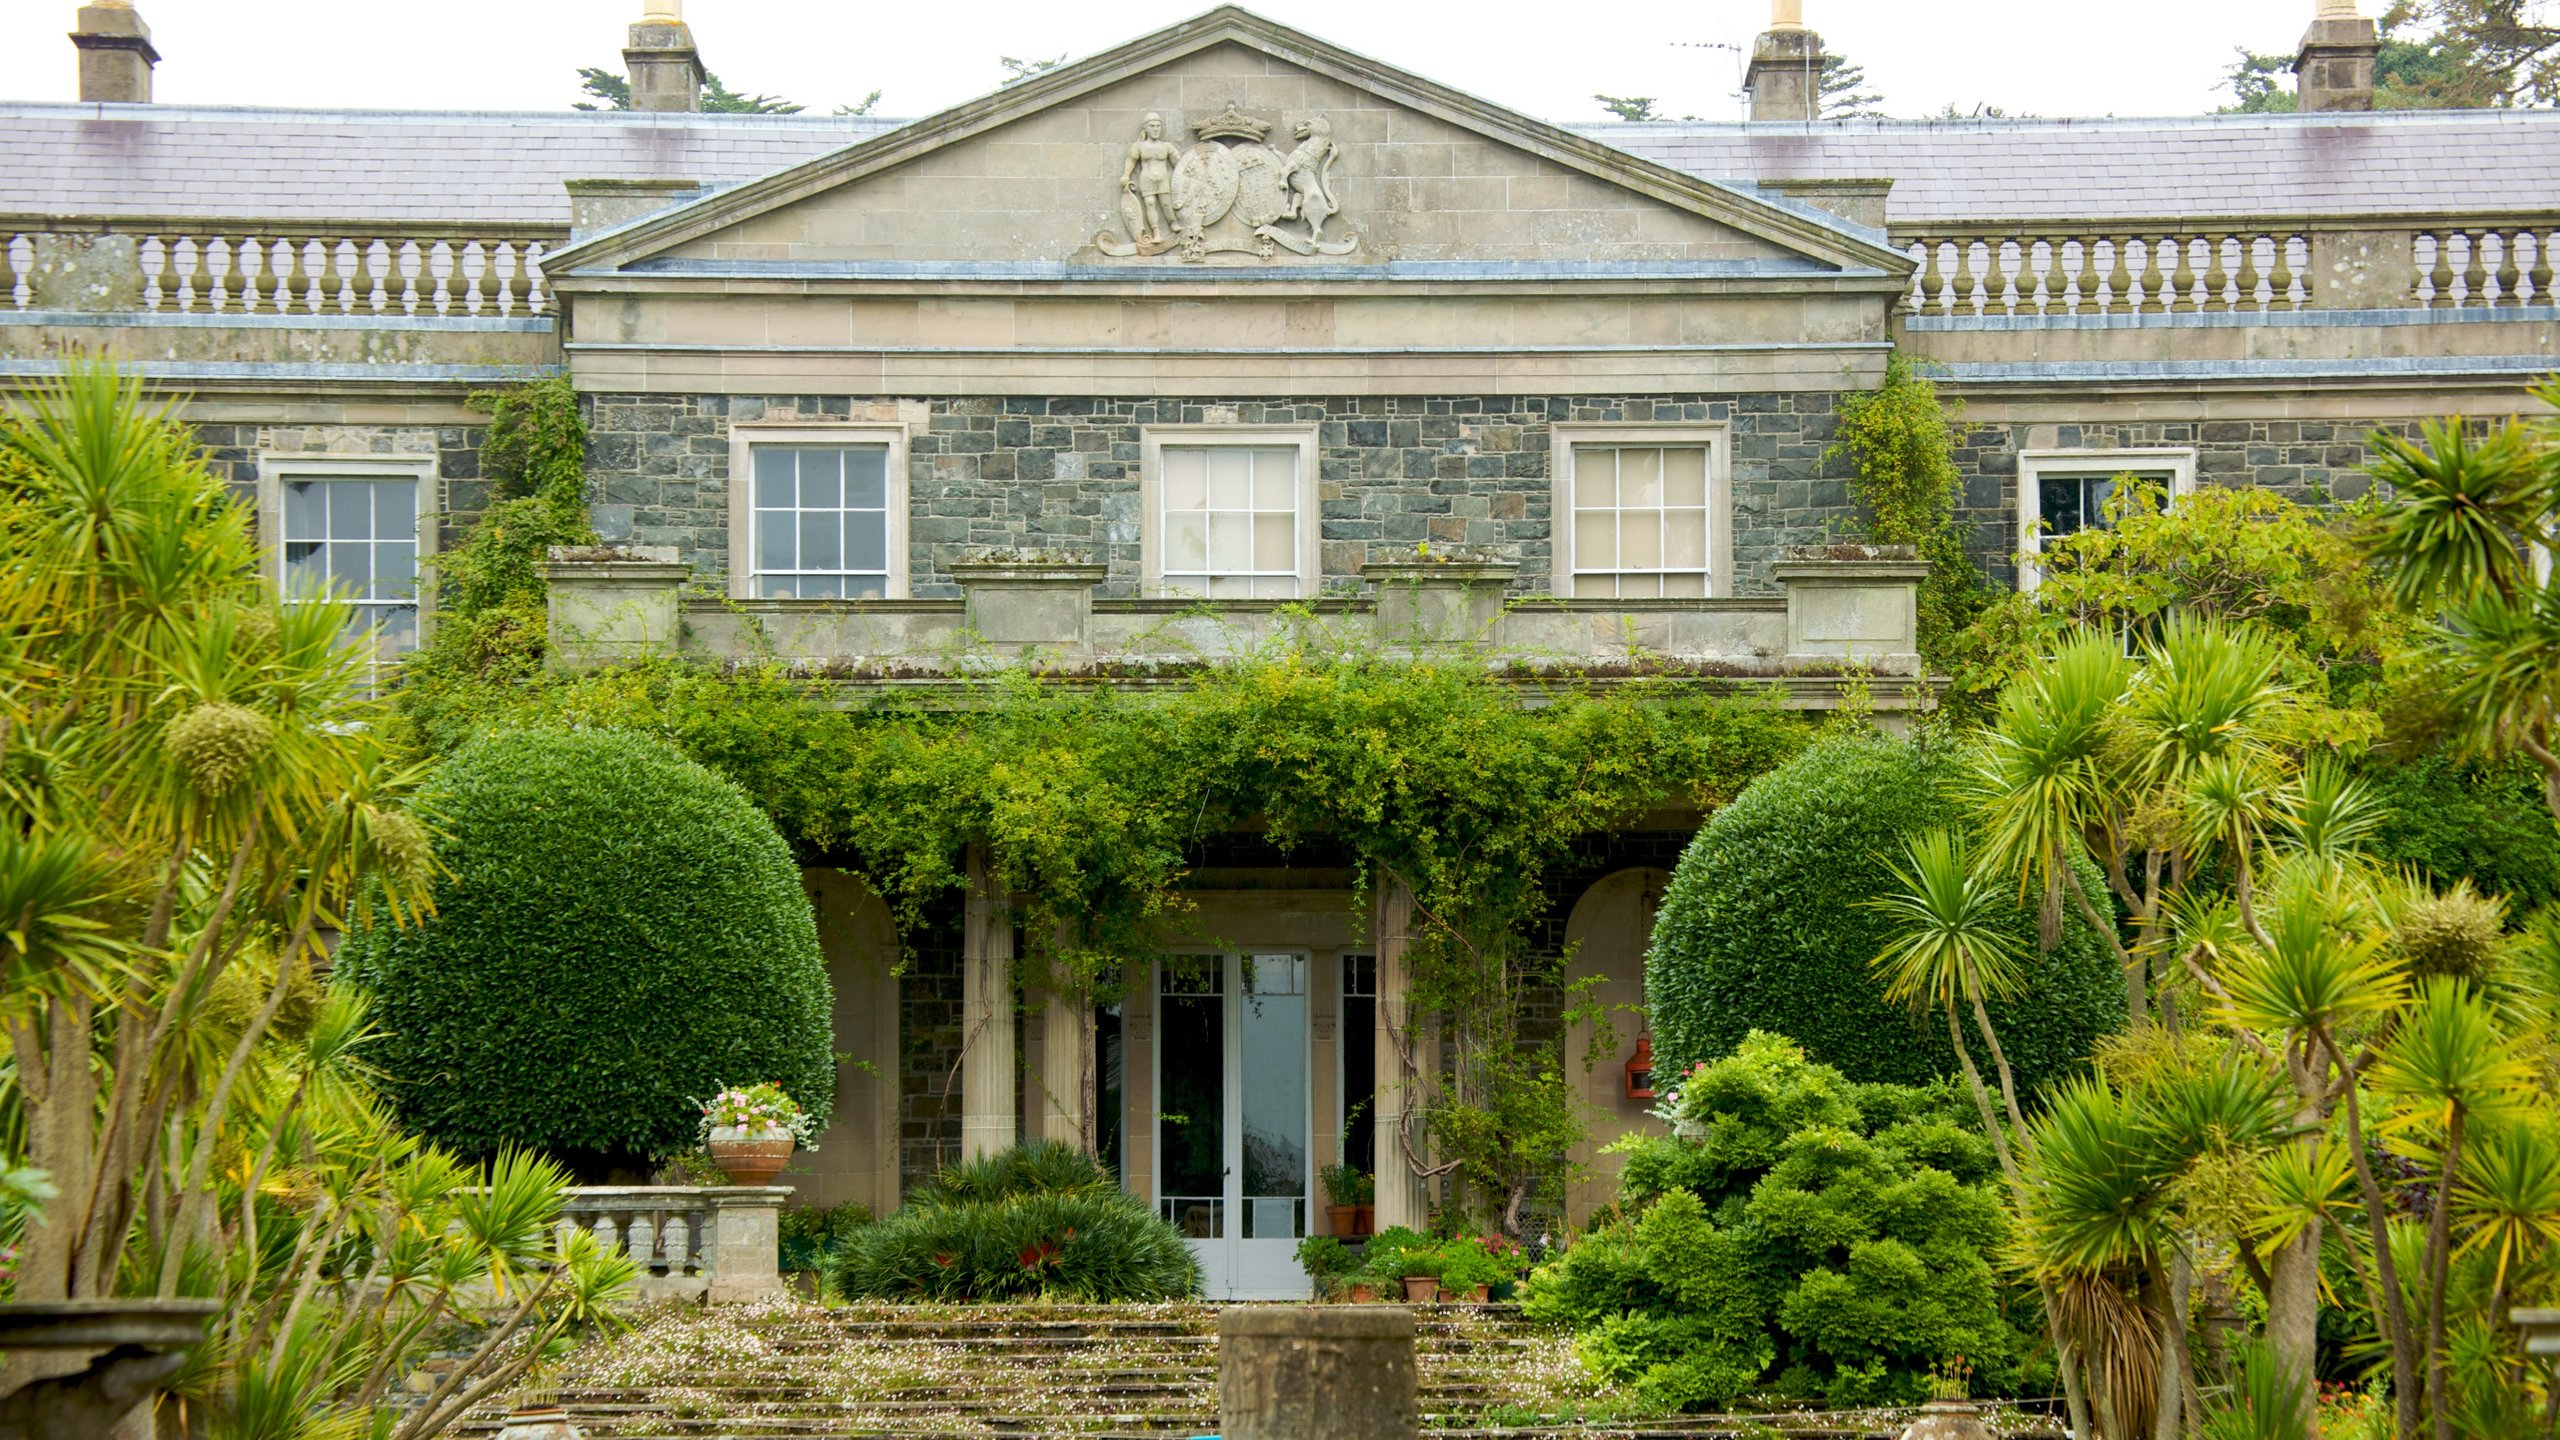 County Down, Northern Ireland, United Kingdom